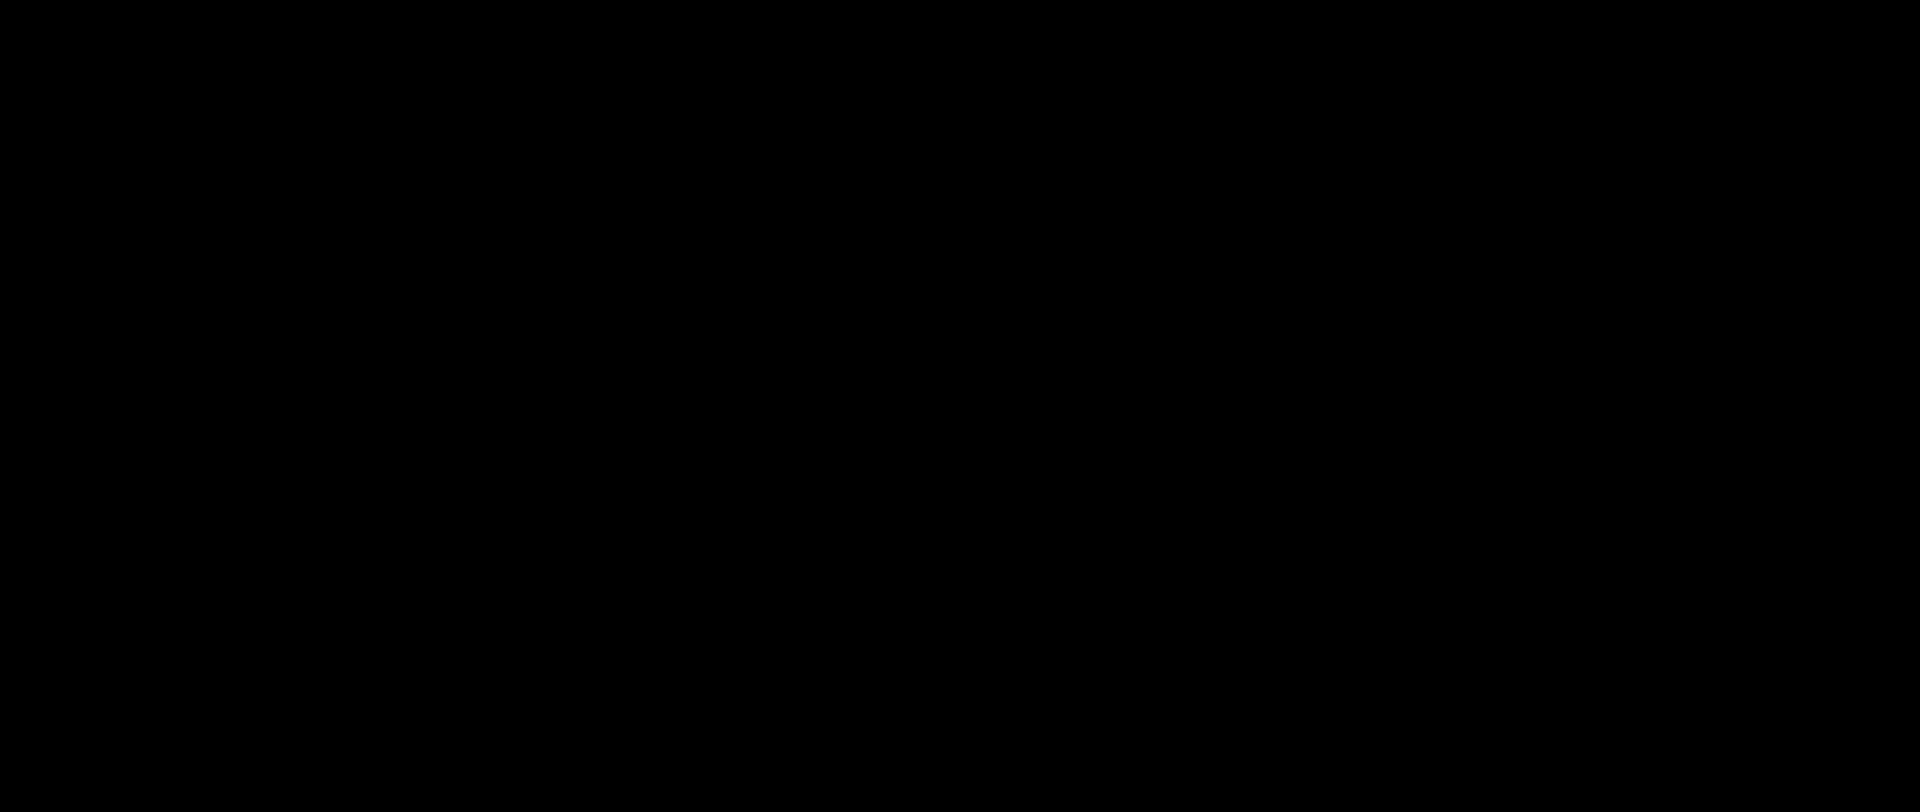 Herrenmode-Potsdam-Makren-logo-Jacob Cohen